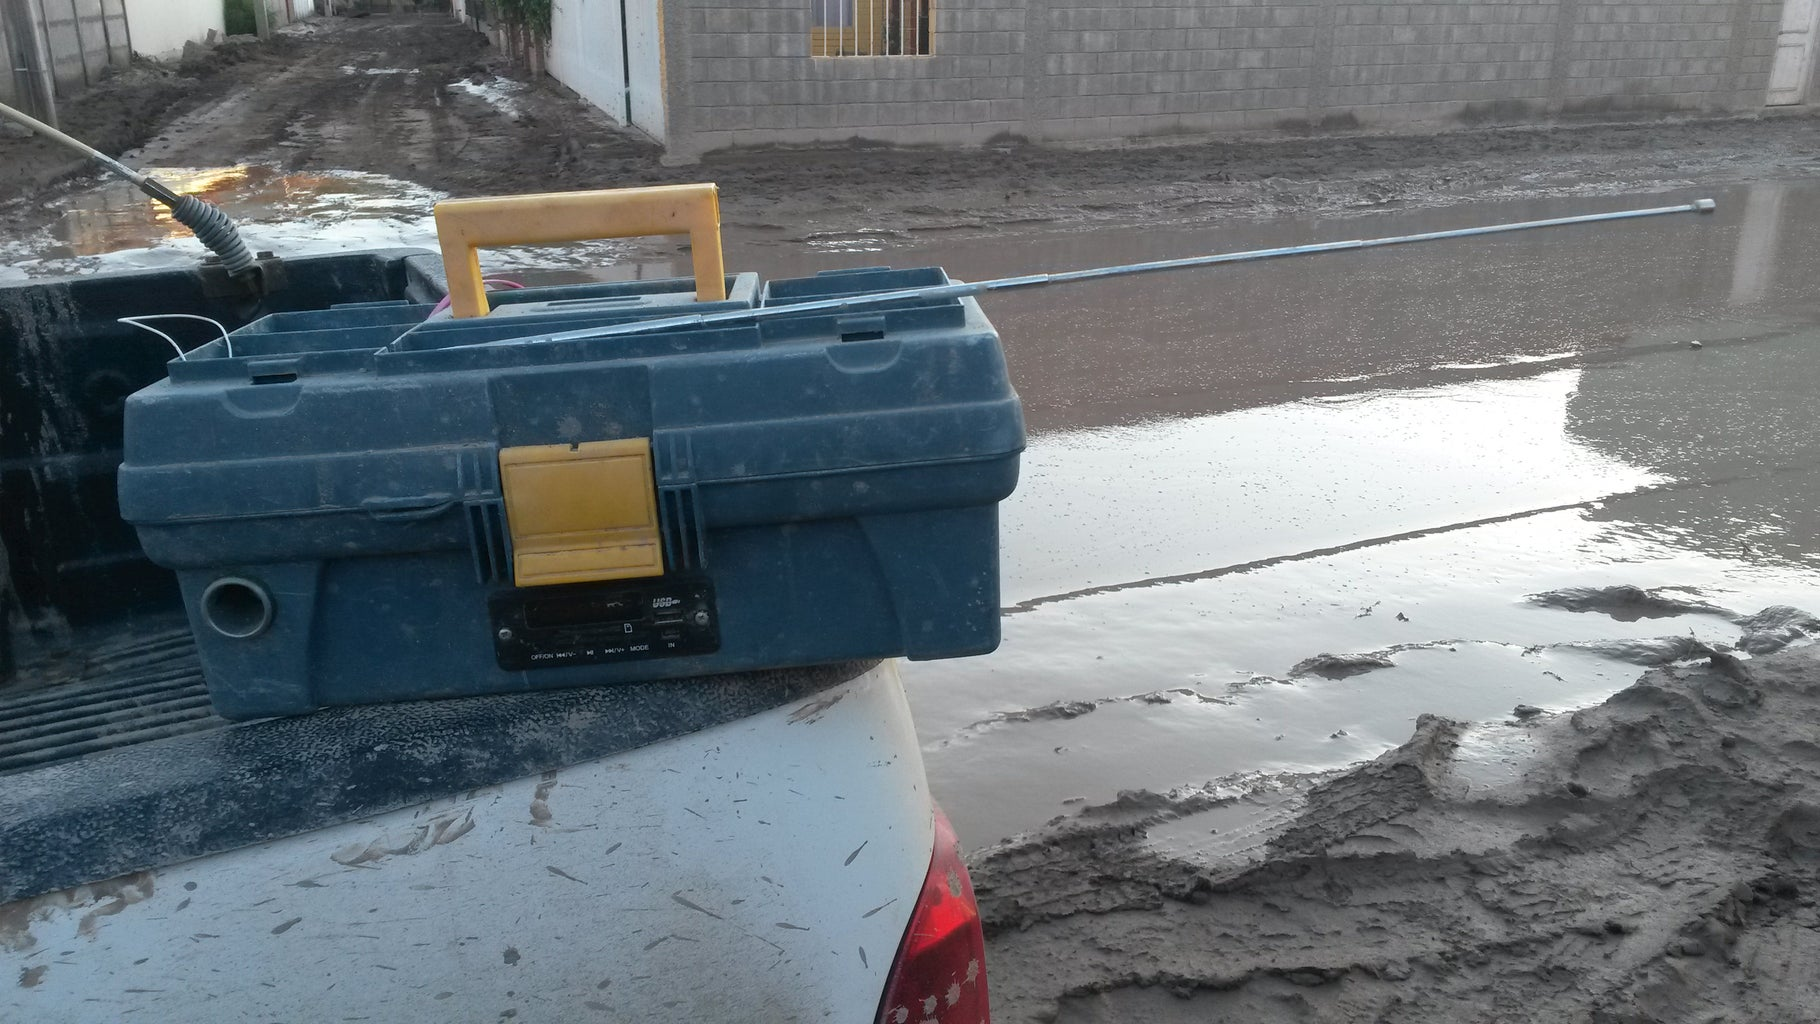 Emergency Power Bank - DIY Toolbox Solar: Radio+ Charger+ Light for Emergency!